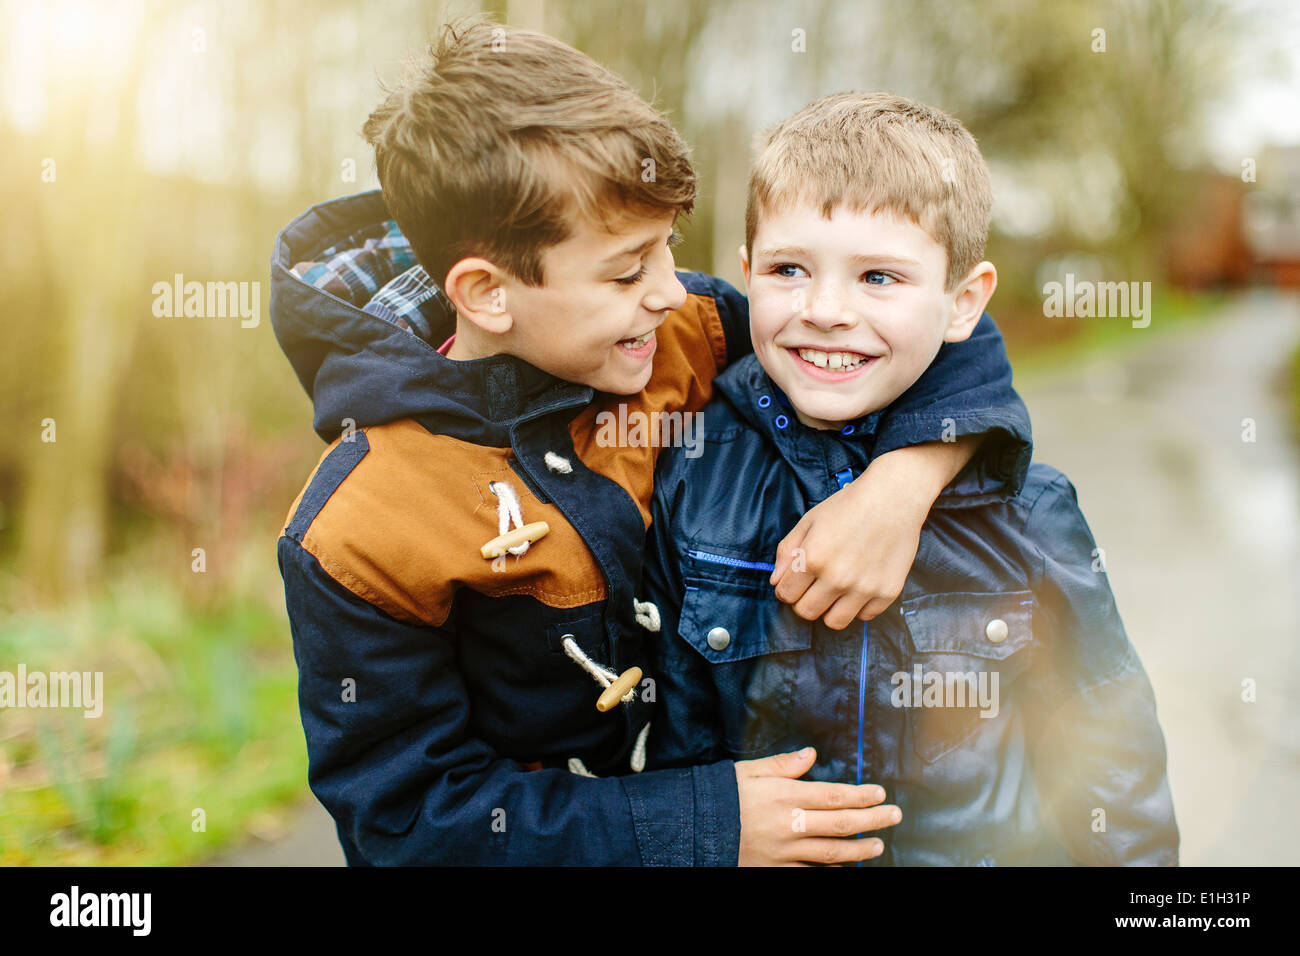 Hermanos abrazarse al aire libre Imagen De Stock